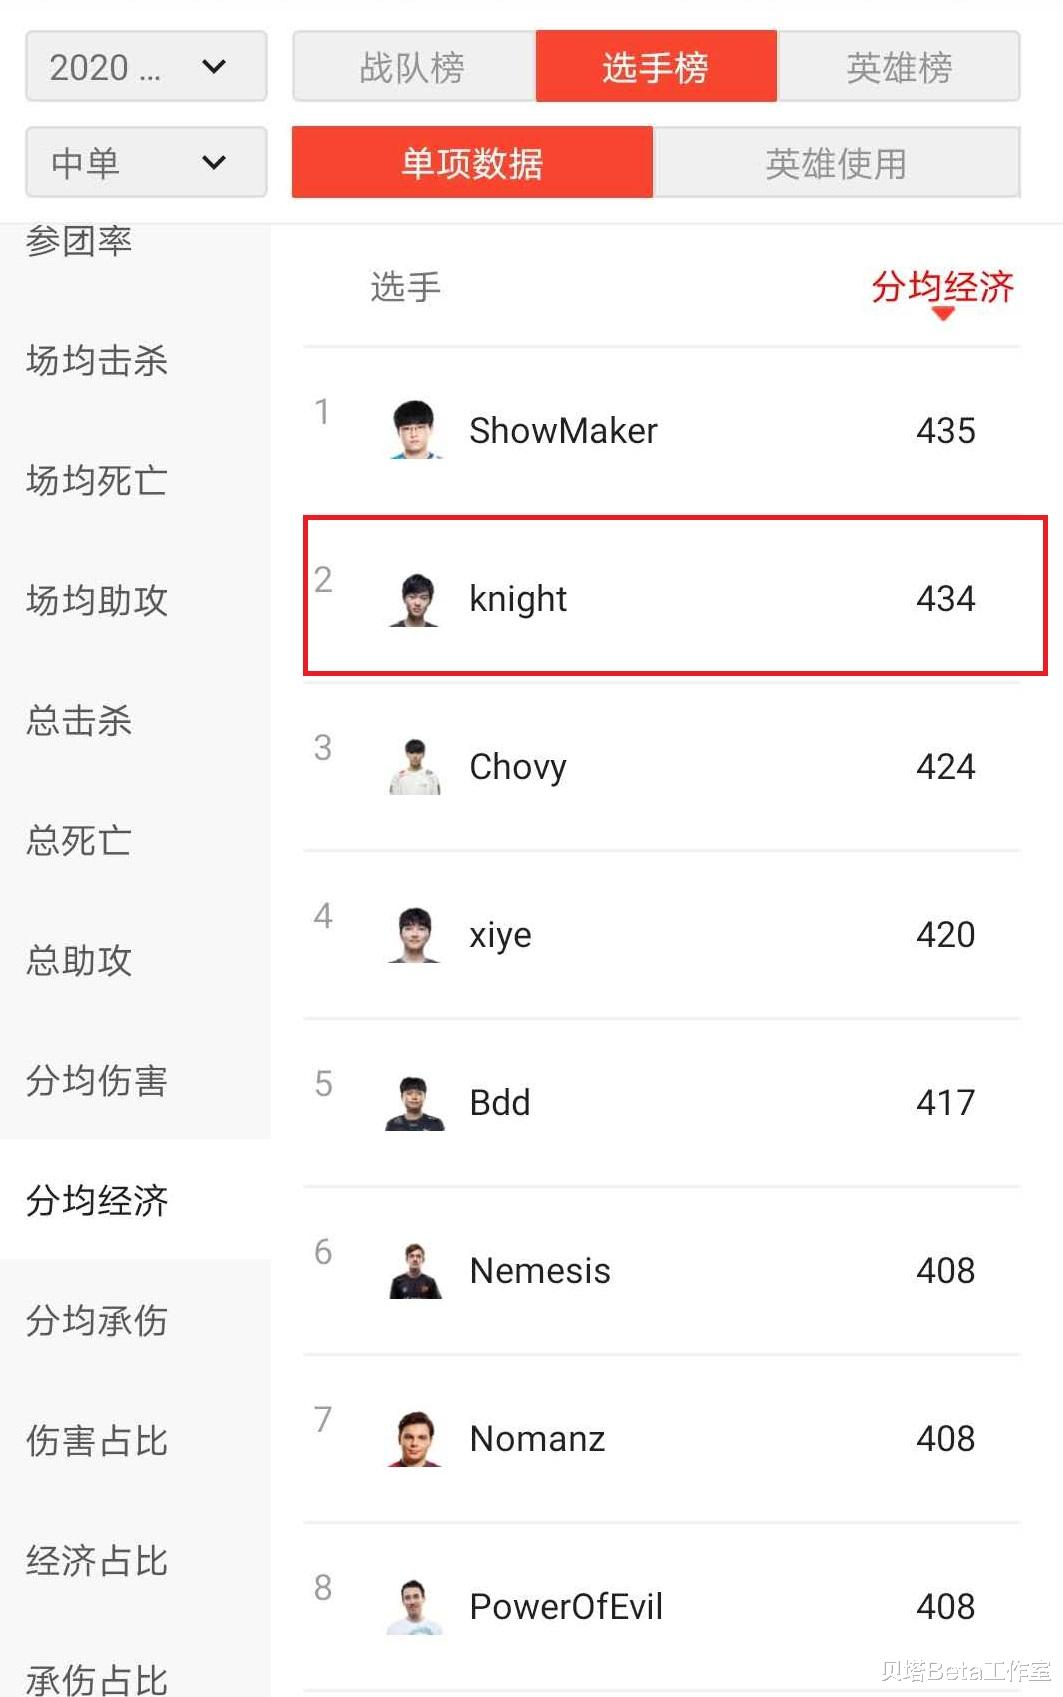 S10小組賽第1輪後,Knight被質疑表現不佳!7項數據排名倒數-圖5